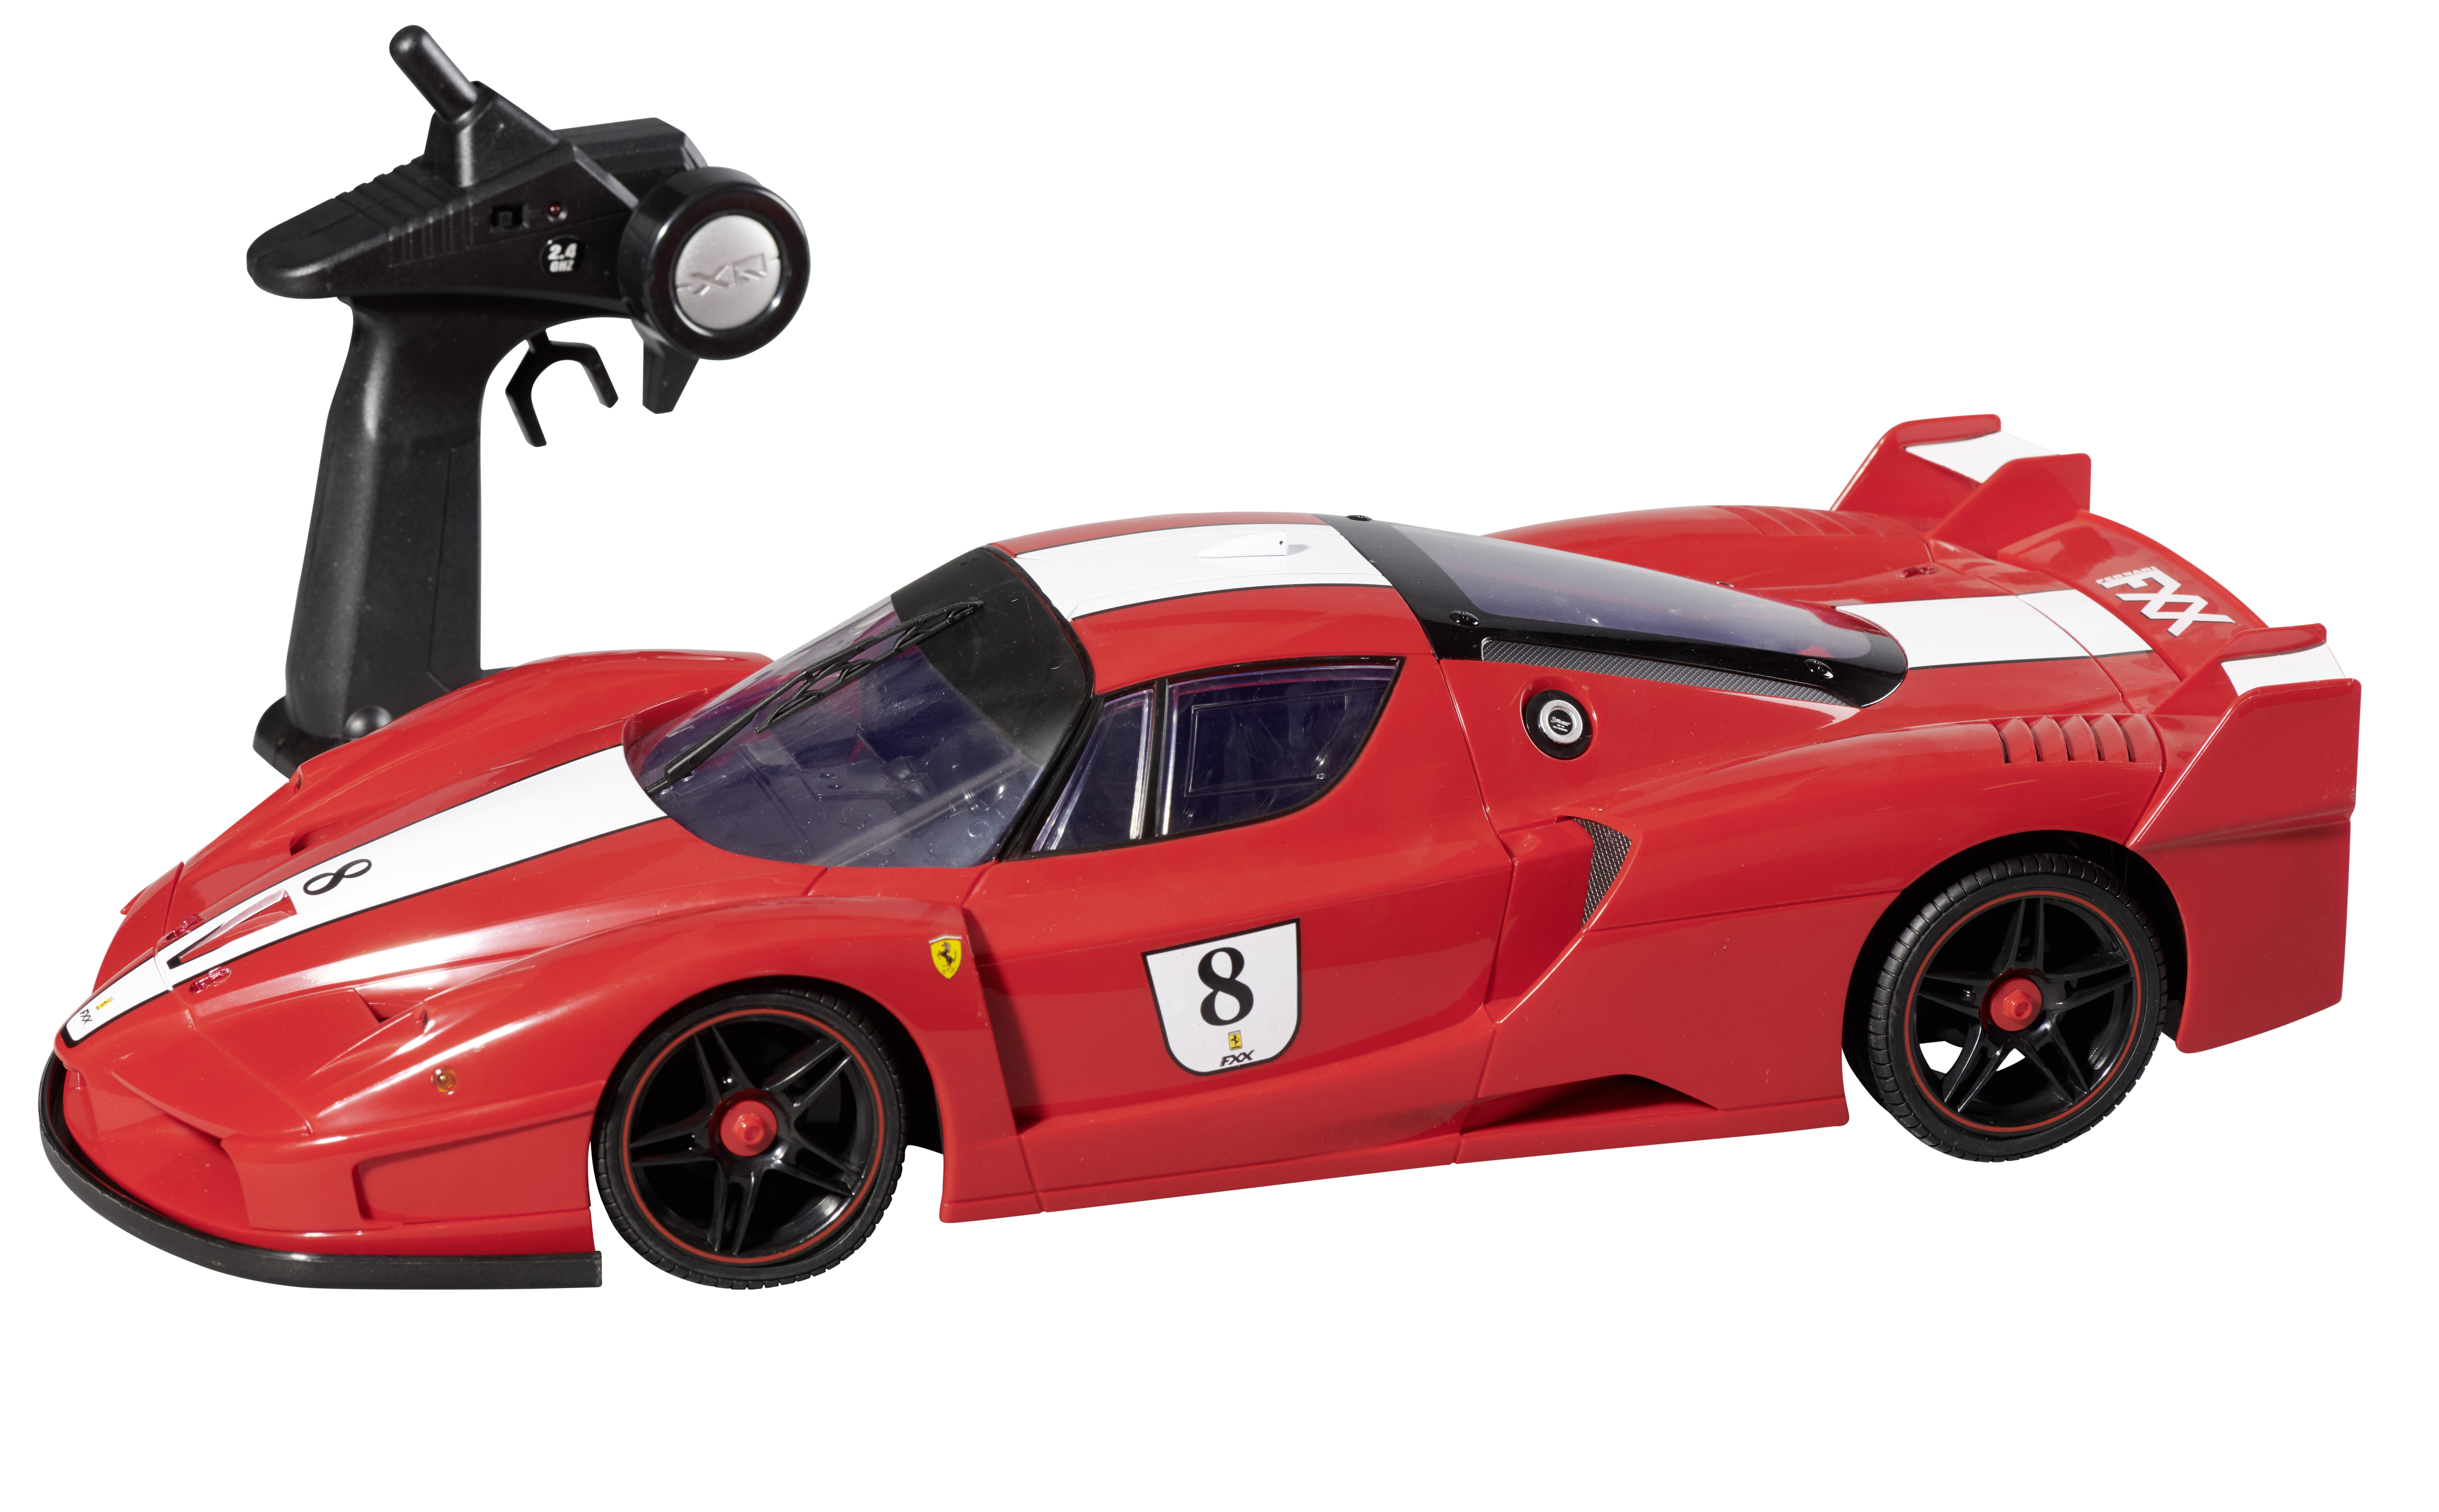 Xq Rouge Pas Ferrari Fxx Multifonctions Racing Radiocommandée wOX8n0Pk